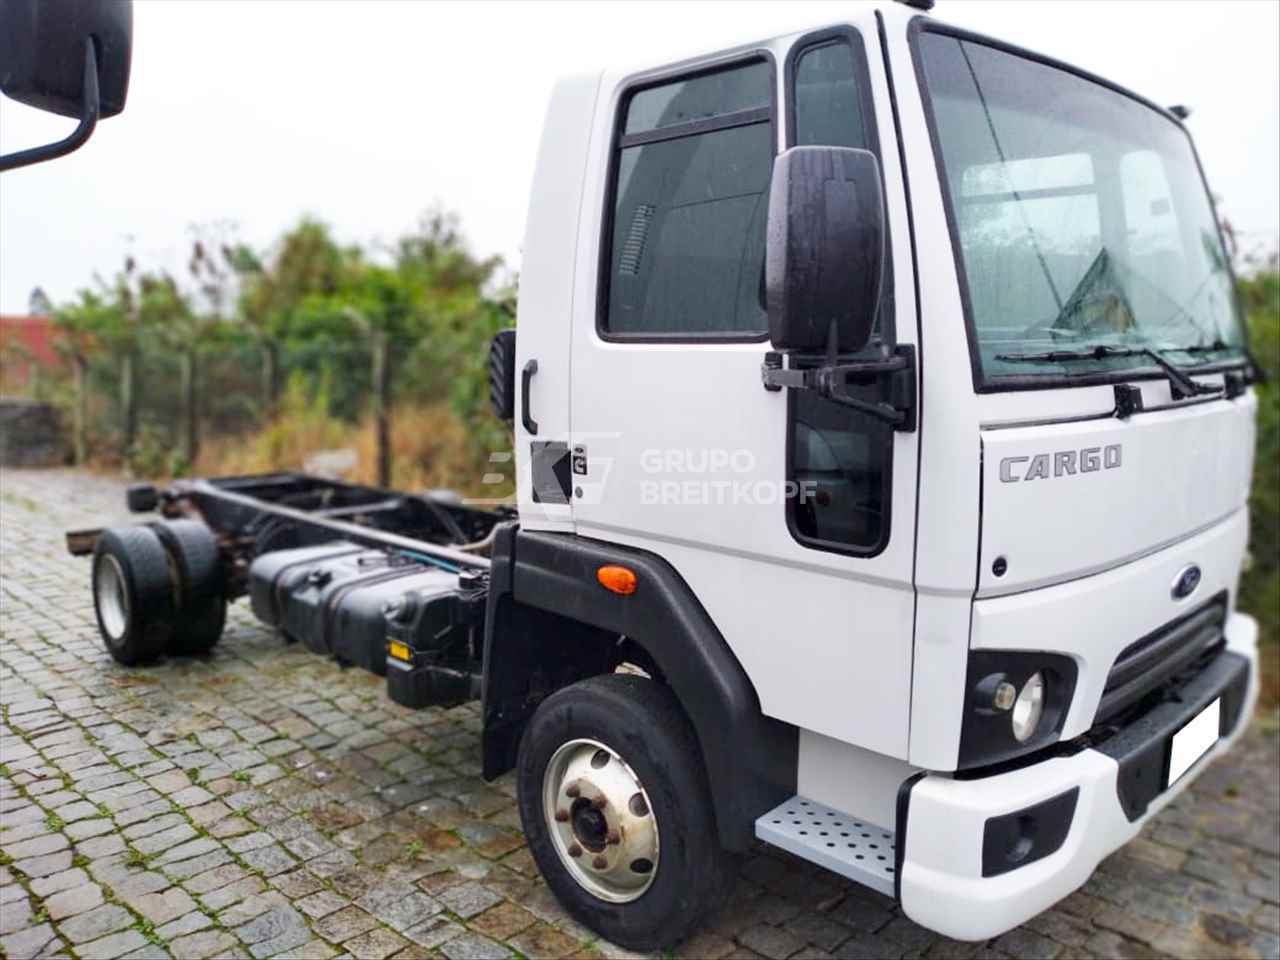 CAMINHAO FORD CARGO 1119 Chassis 3/4 4x2 Breitkopf Veículos - VW ITAJAI SANTA CATARINA SC